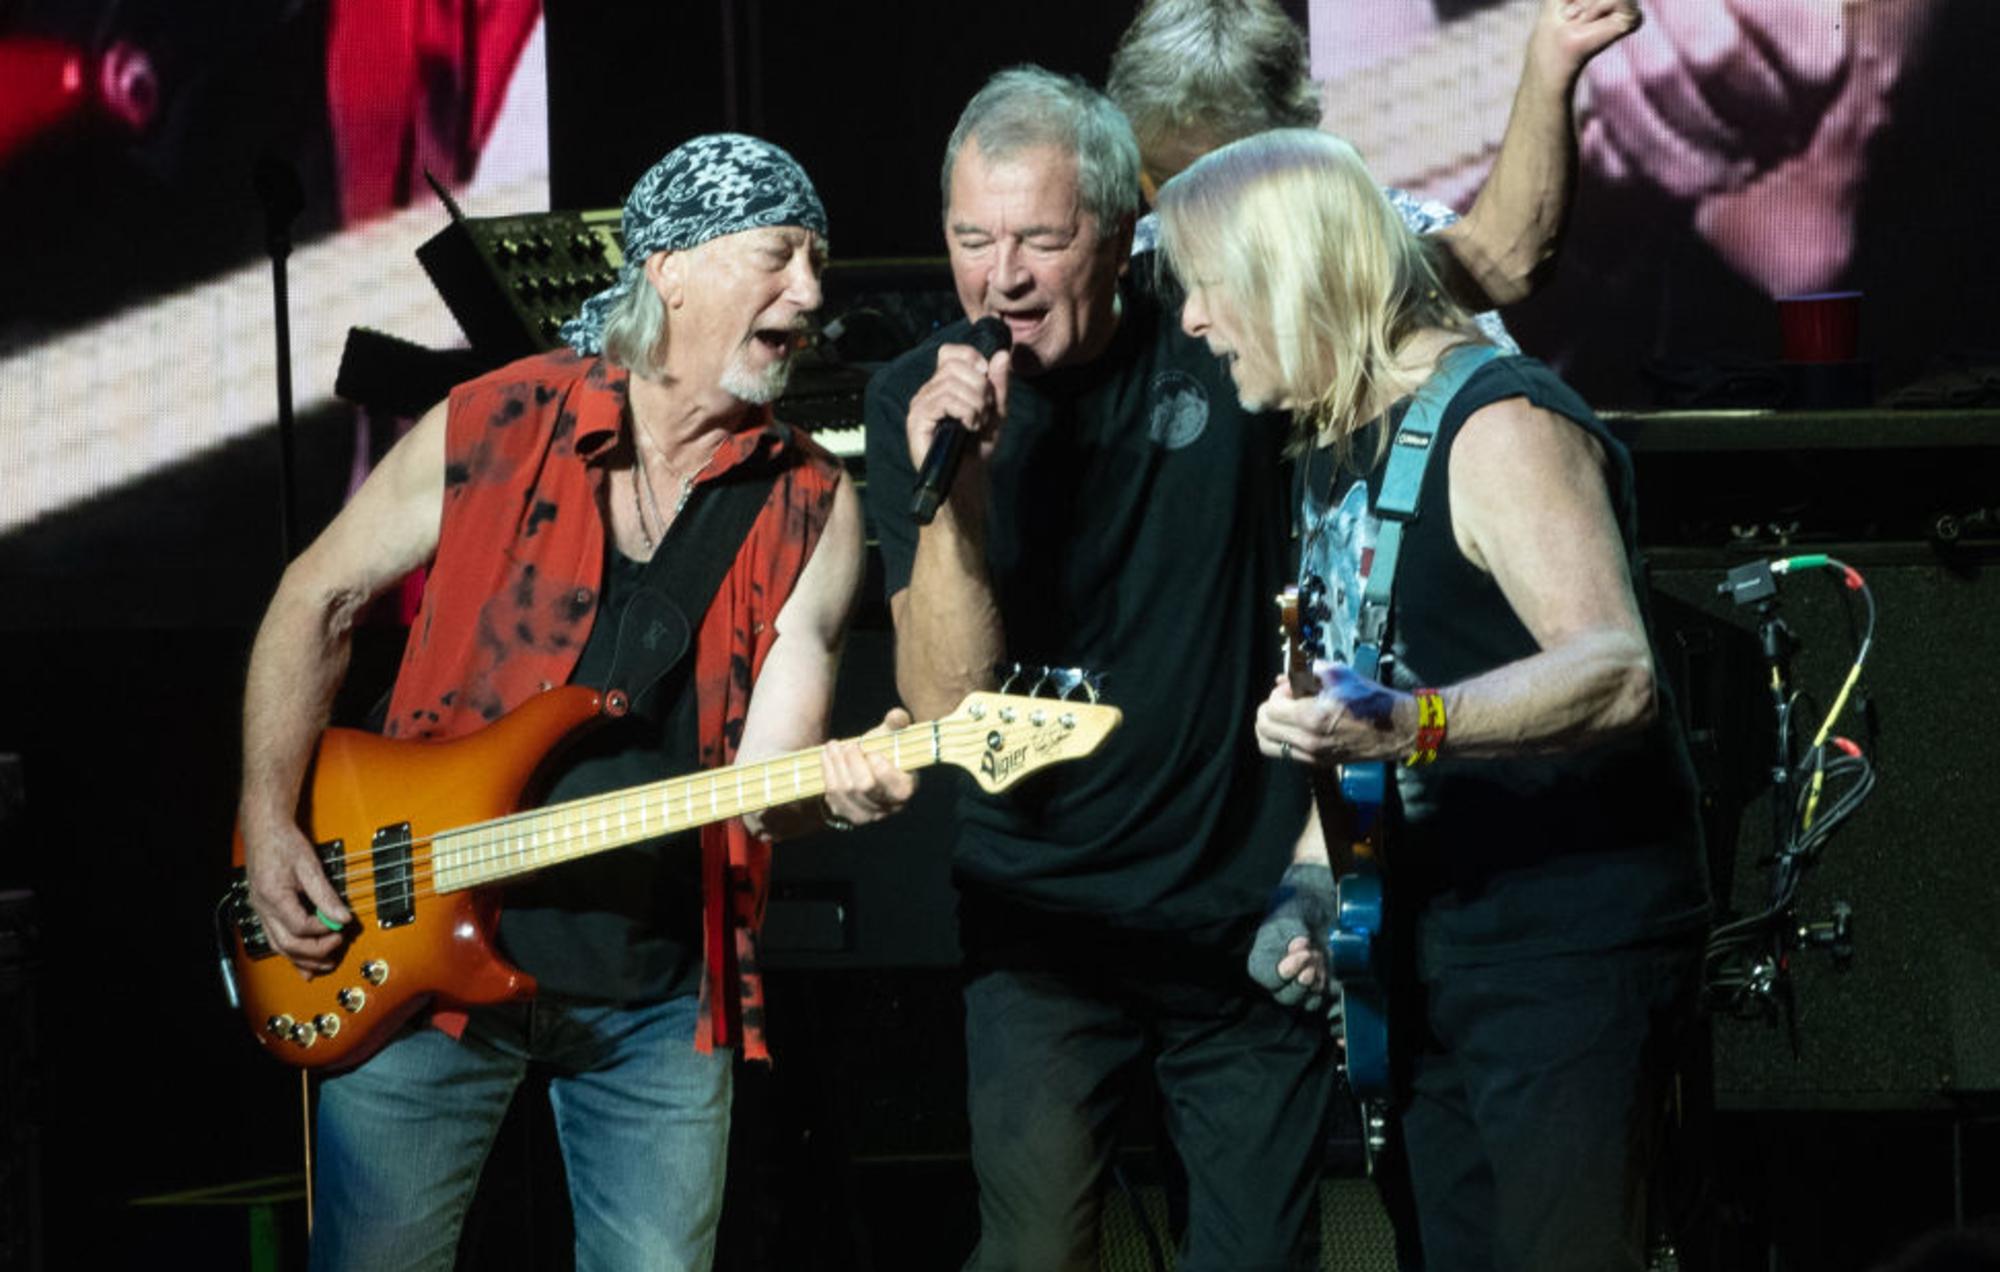 Deep Purple return with triumphant new single 'Throw My Bones' - EpicNews